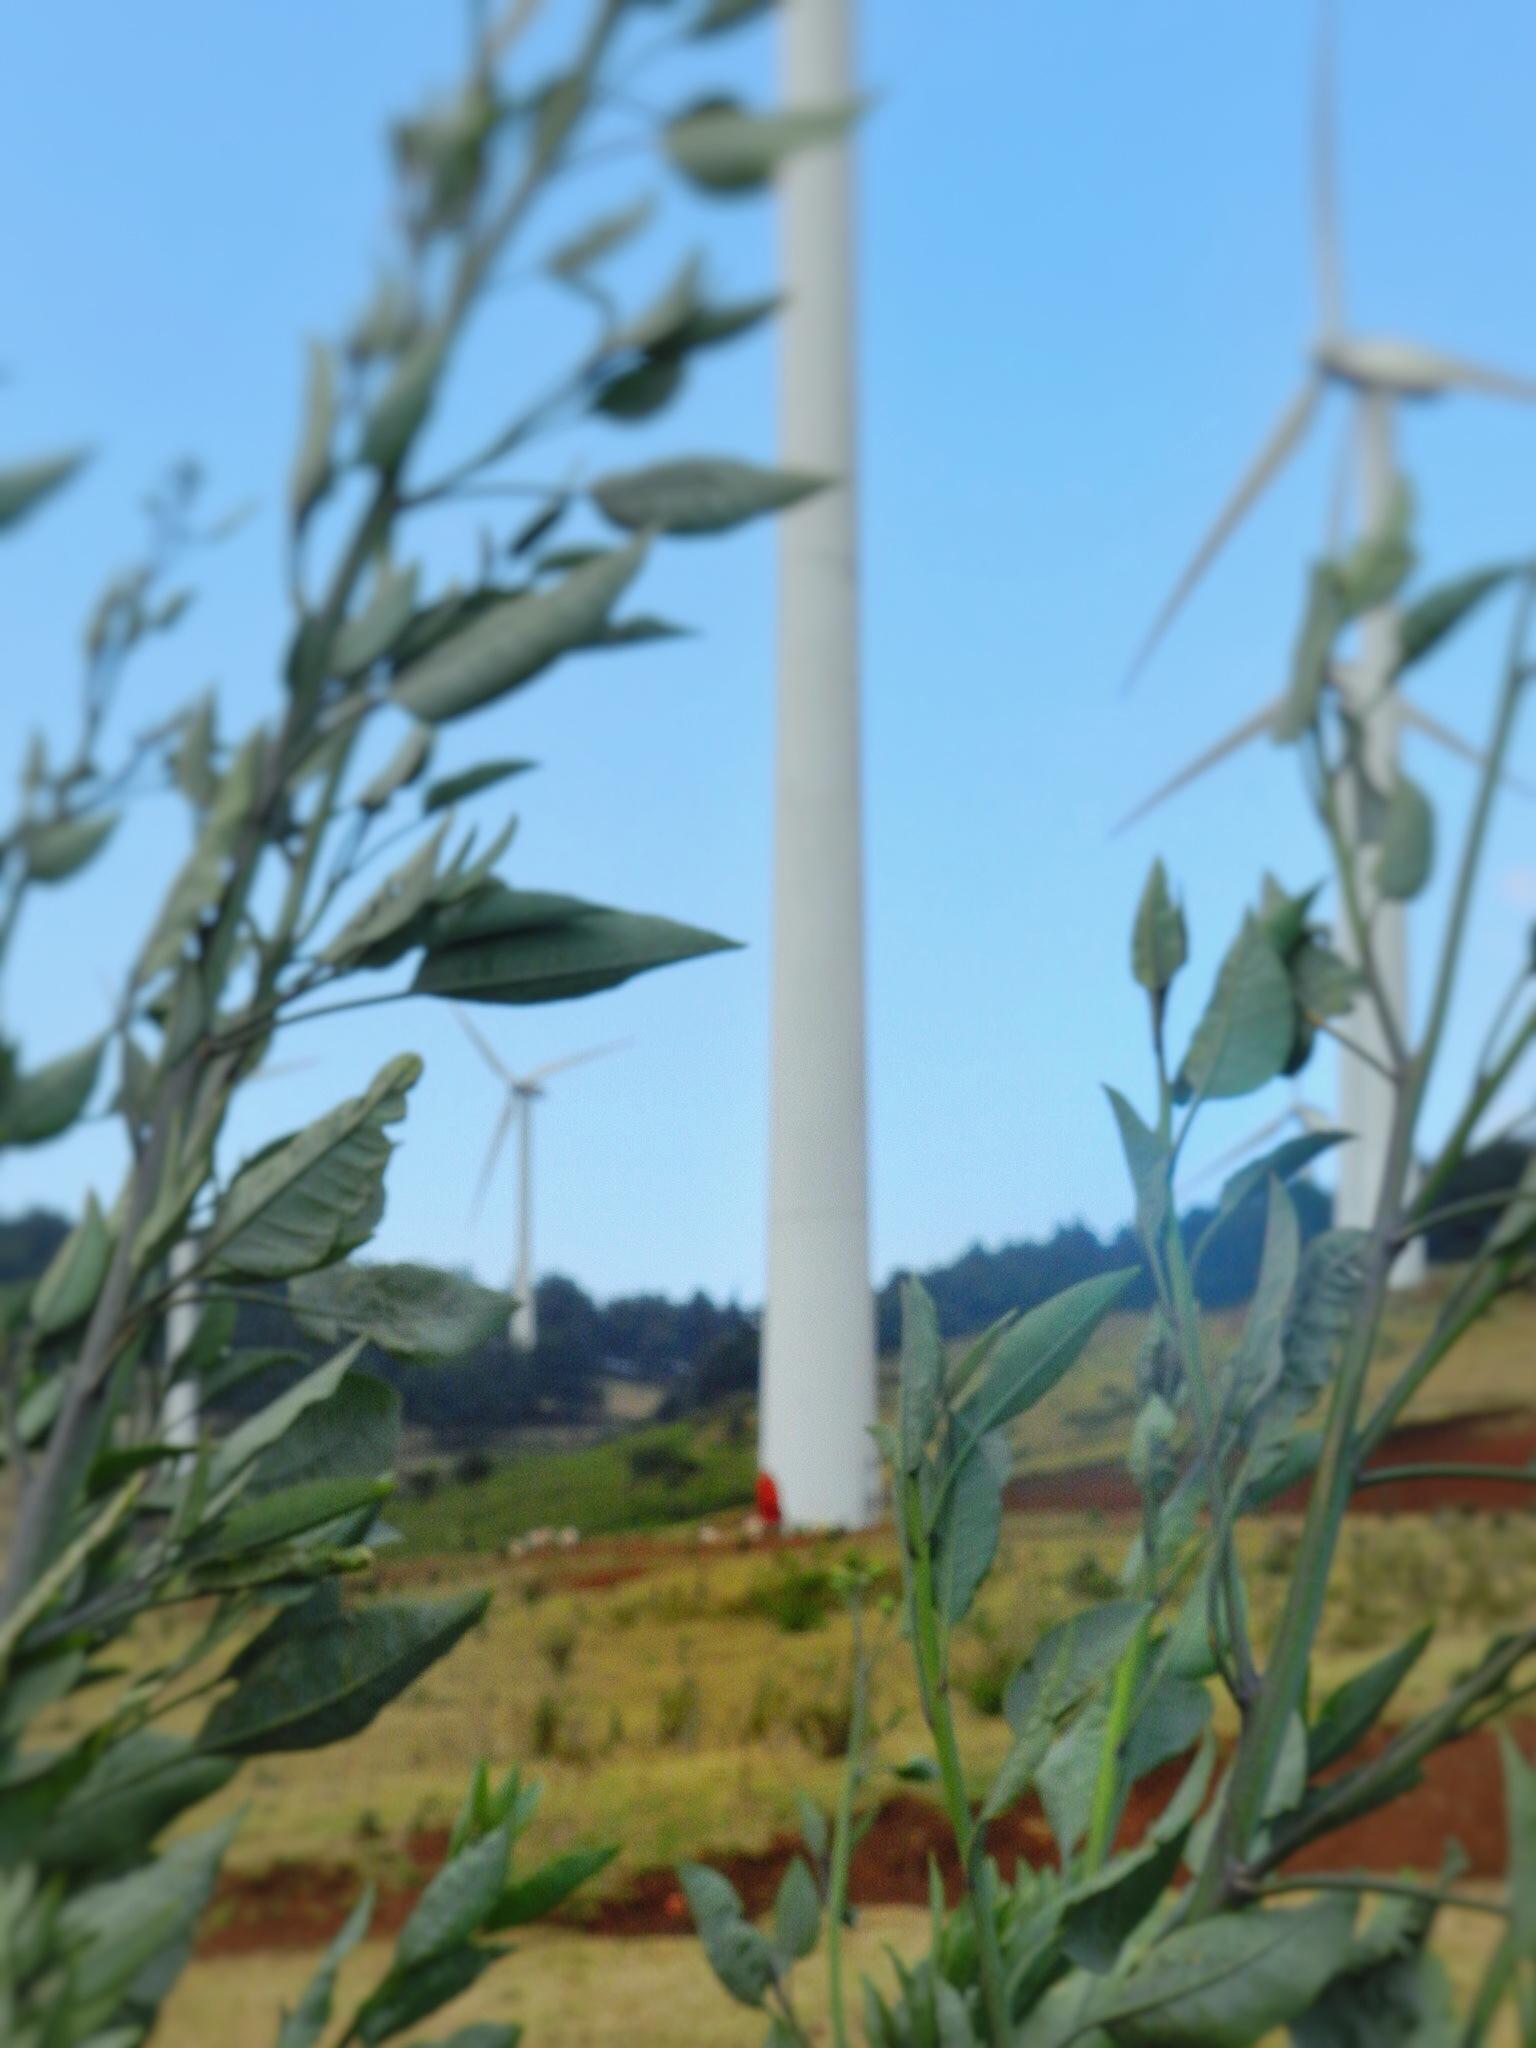 ngong-hills-wind-farm